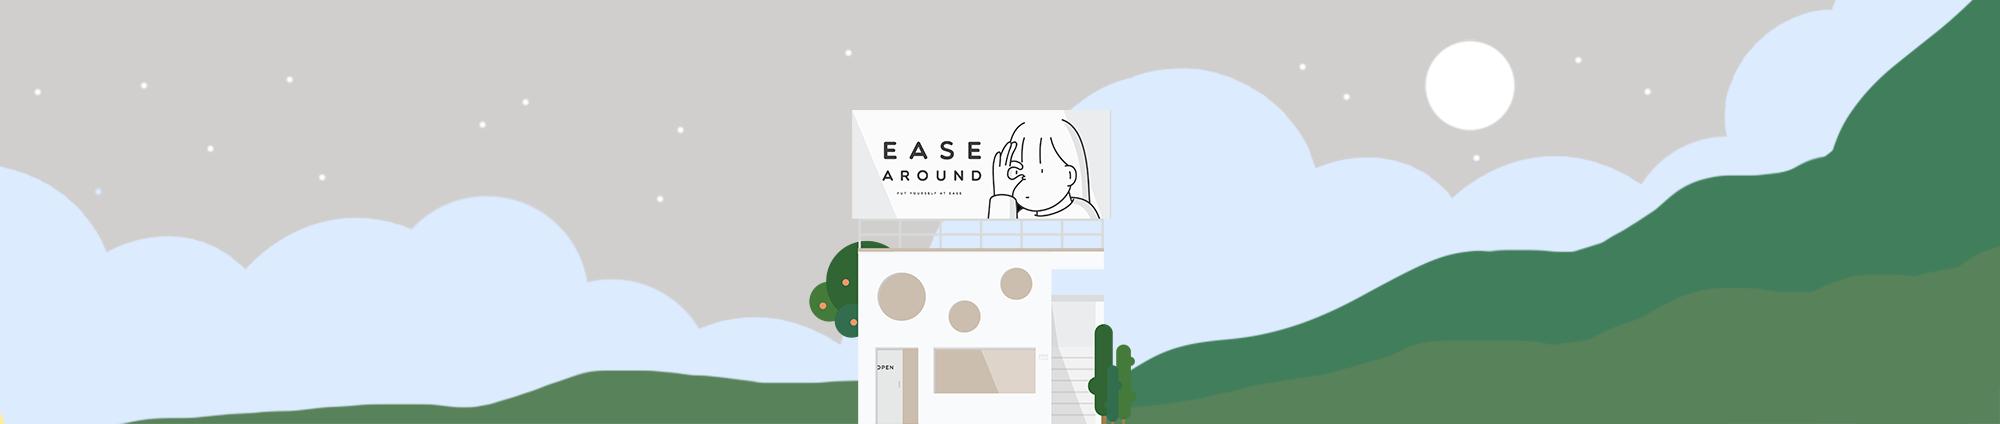 Ease Around